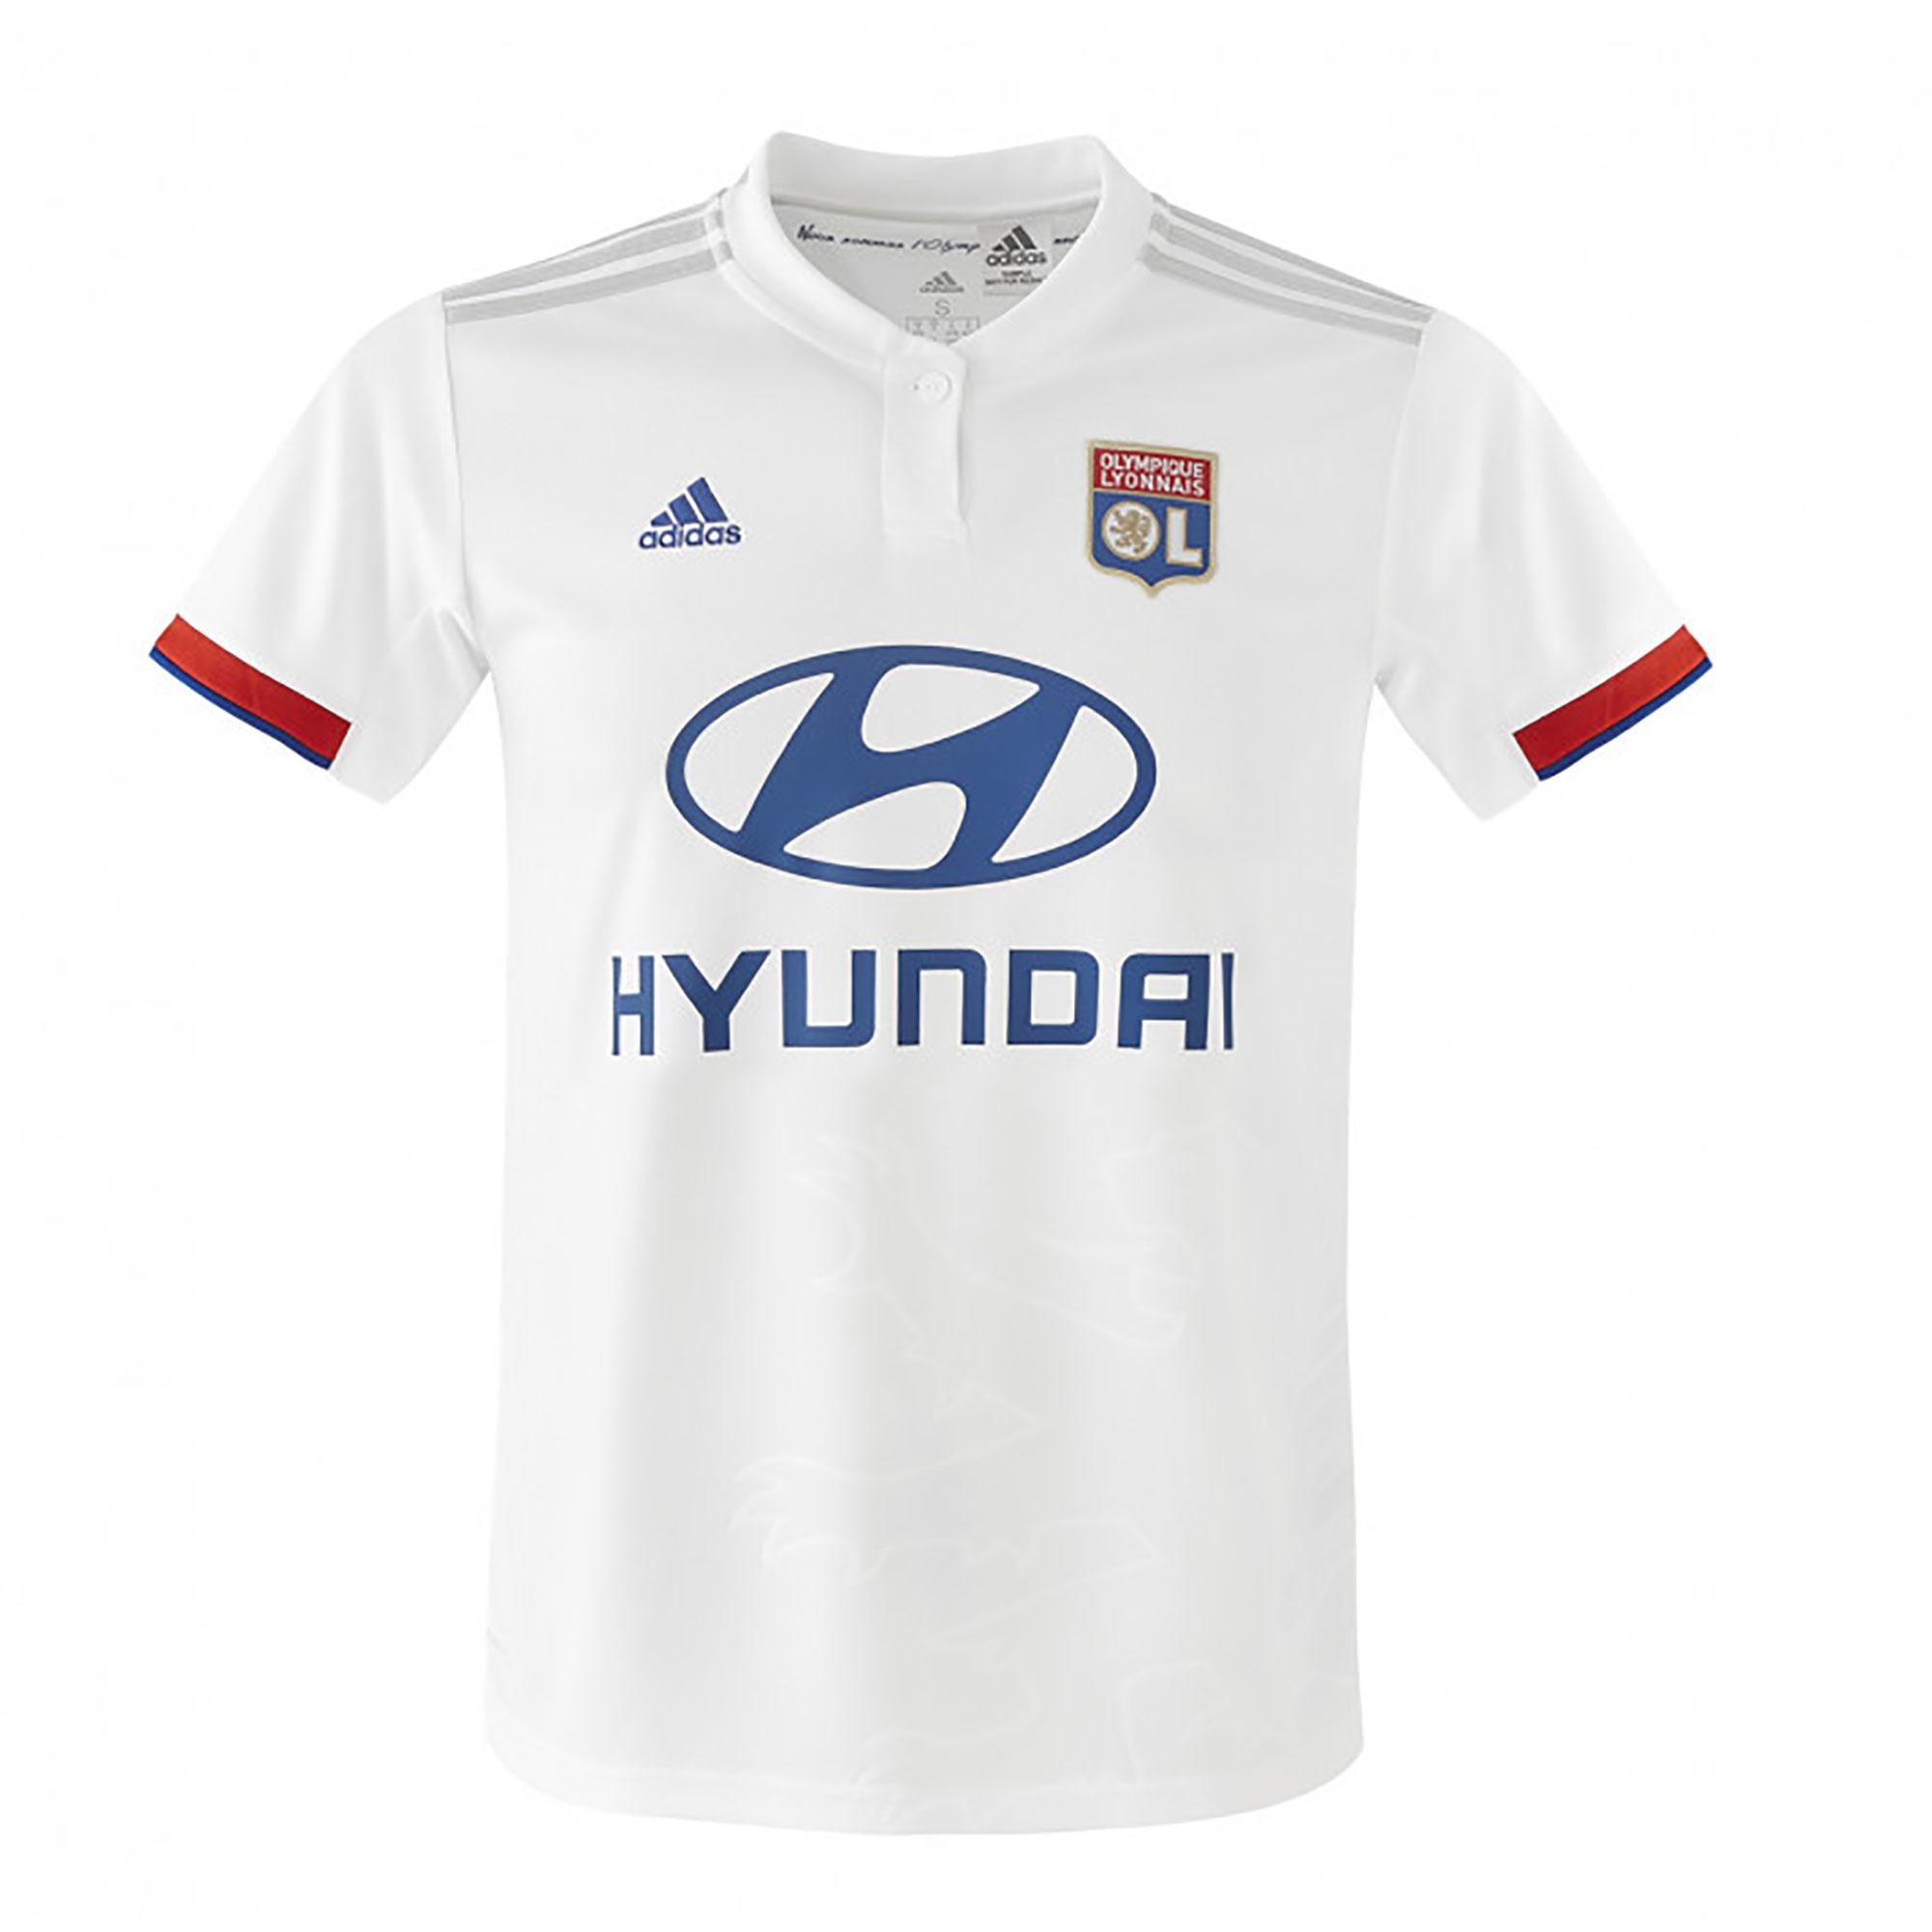 Olympique Lyonnais Home shirt